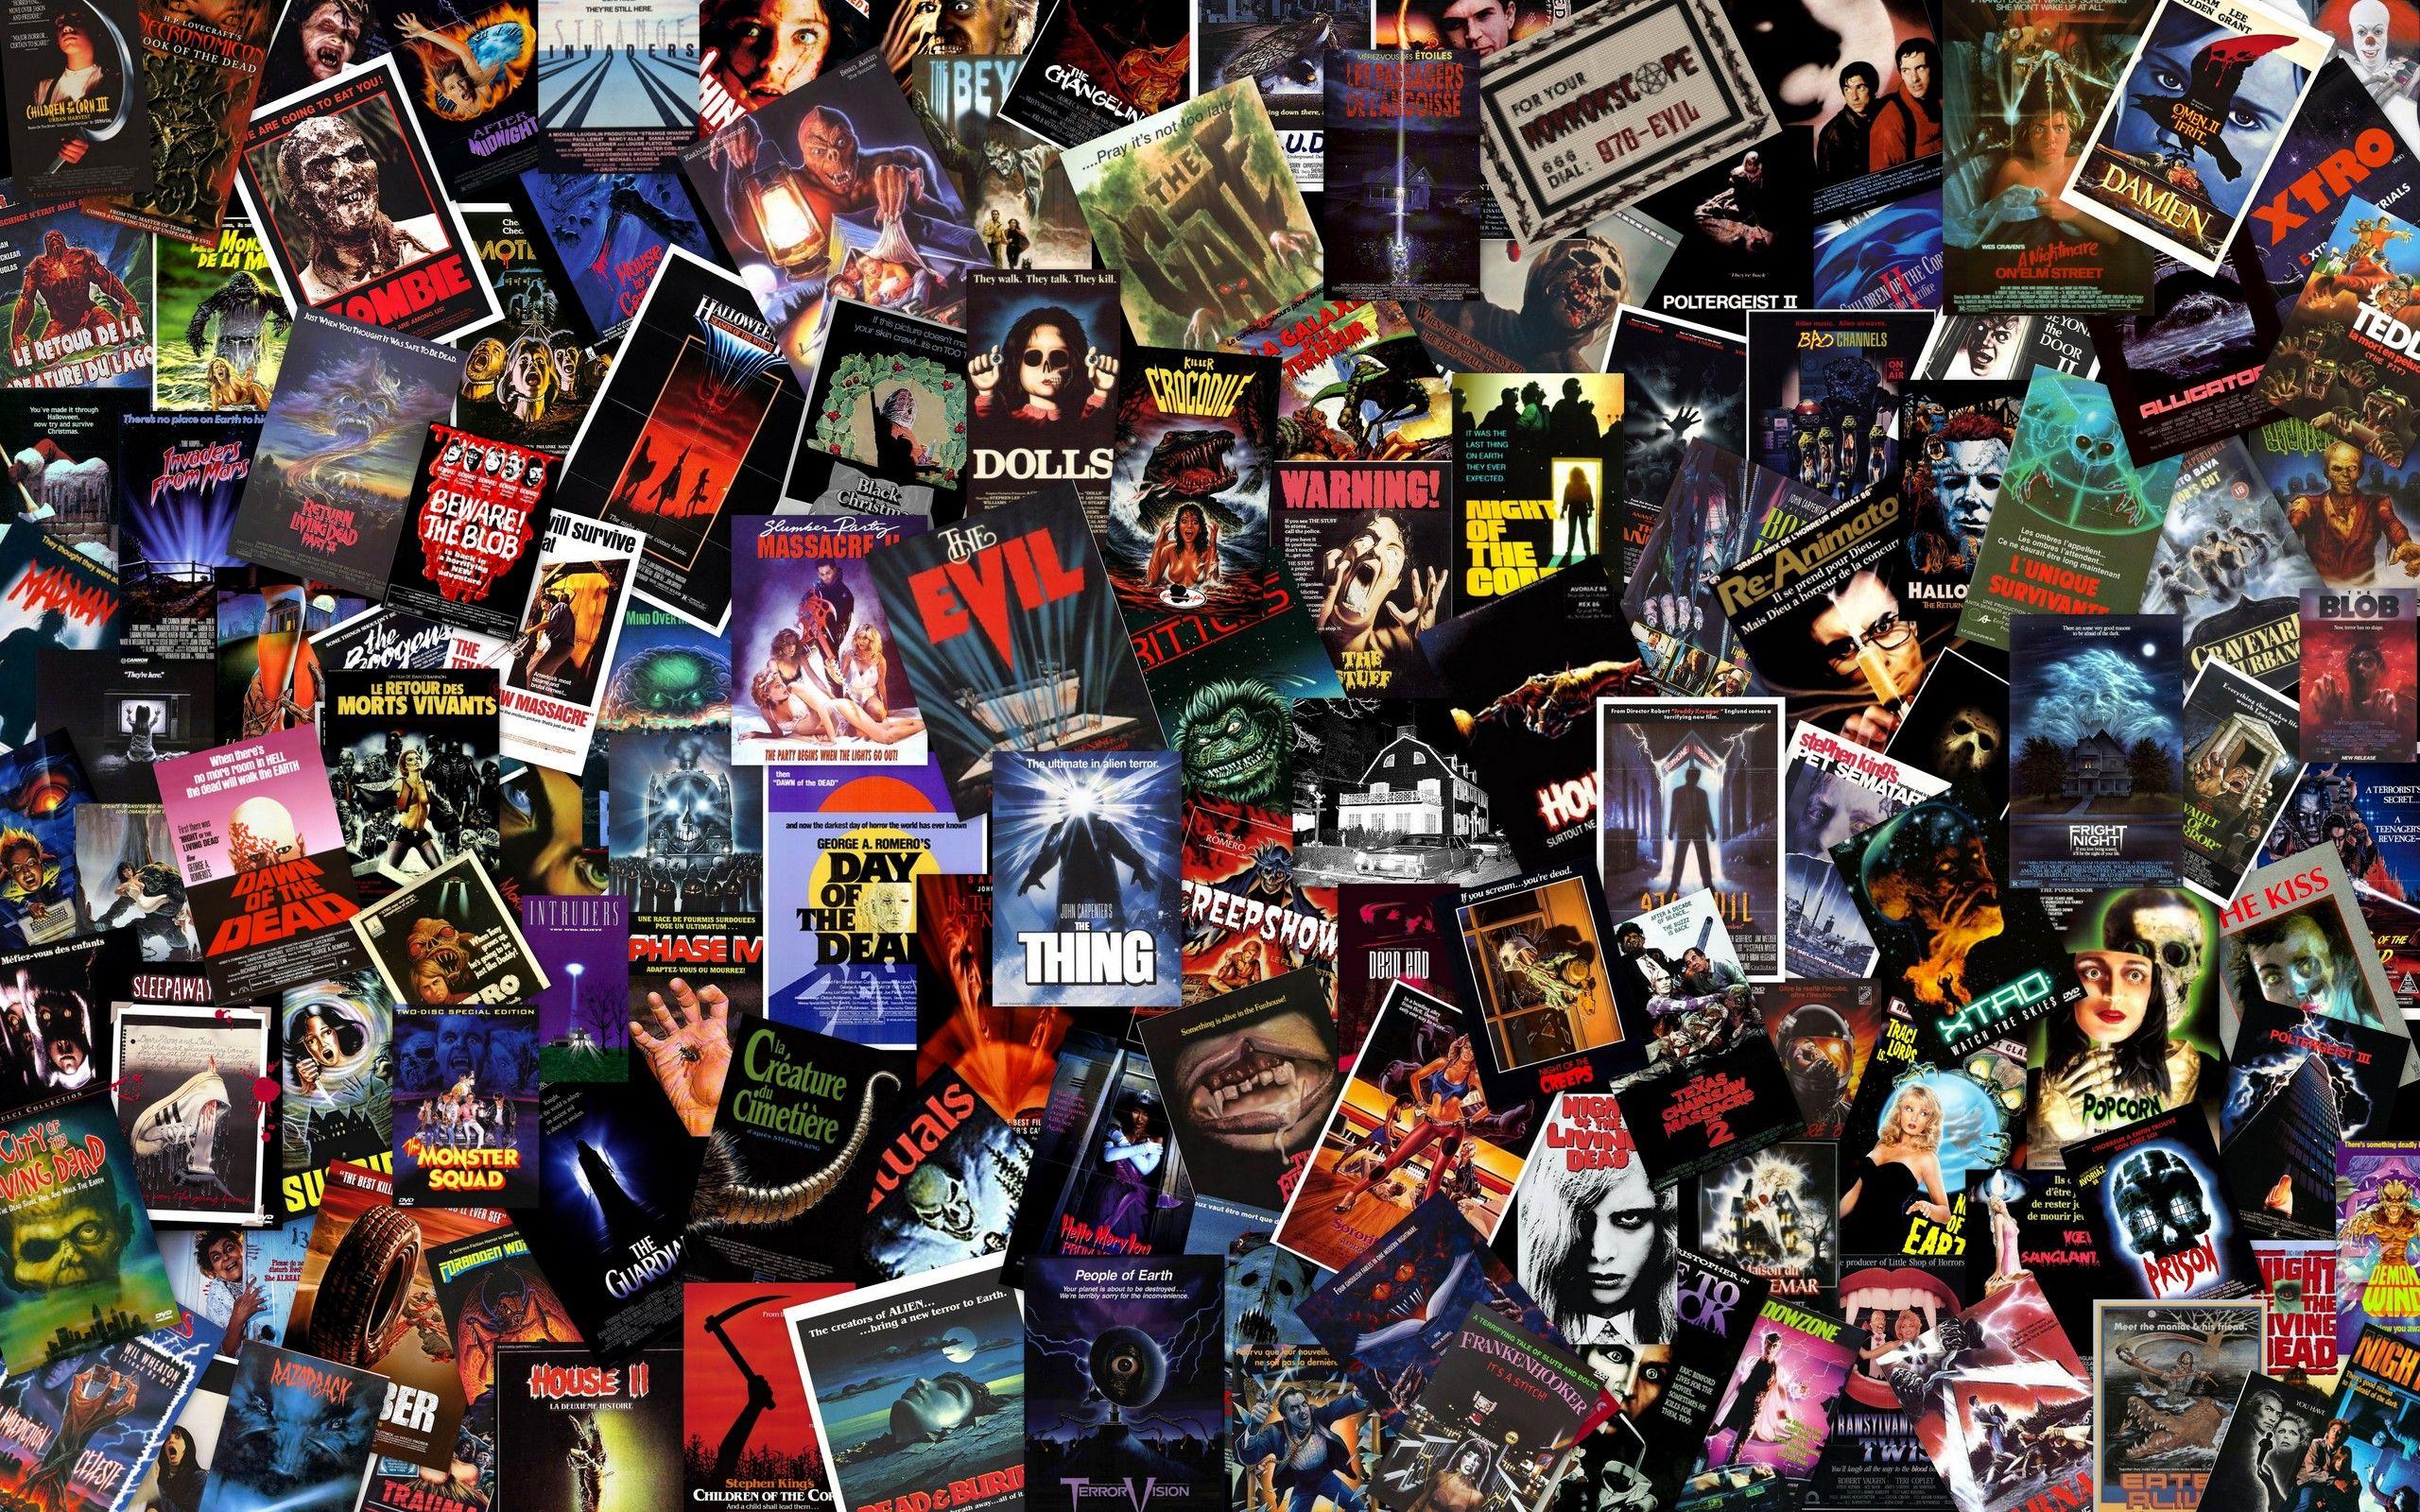 Horror Movies Wallpaper Massive B Horror Collage Wallpaper Horror Movies Movie Themes Top Horror Movies